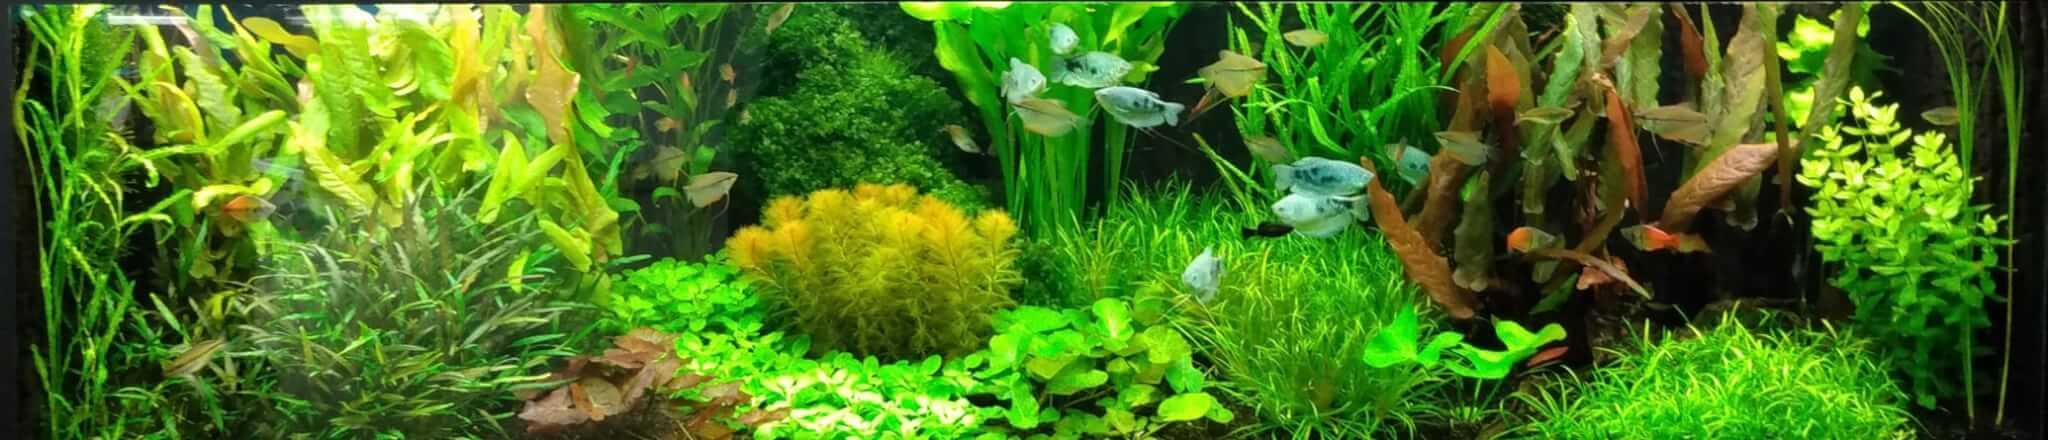 aquarium voorbeeld